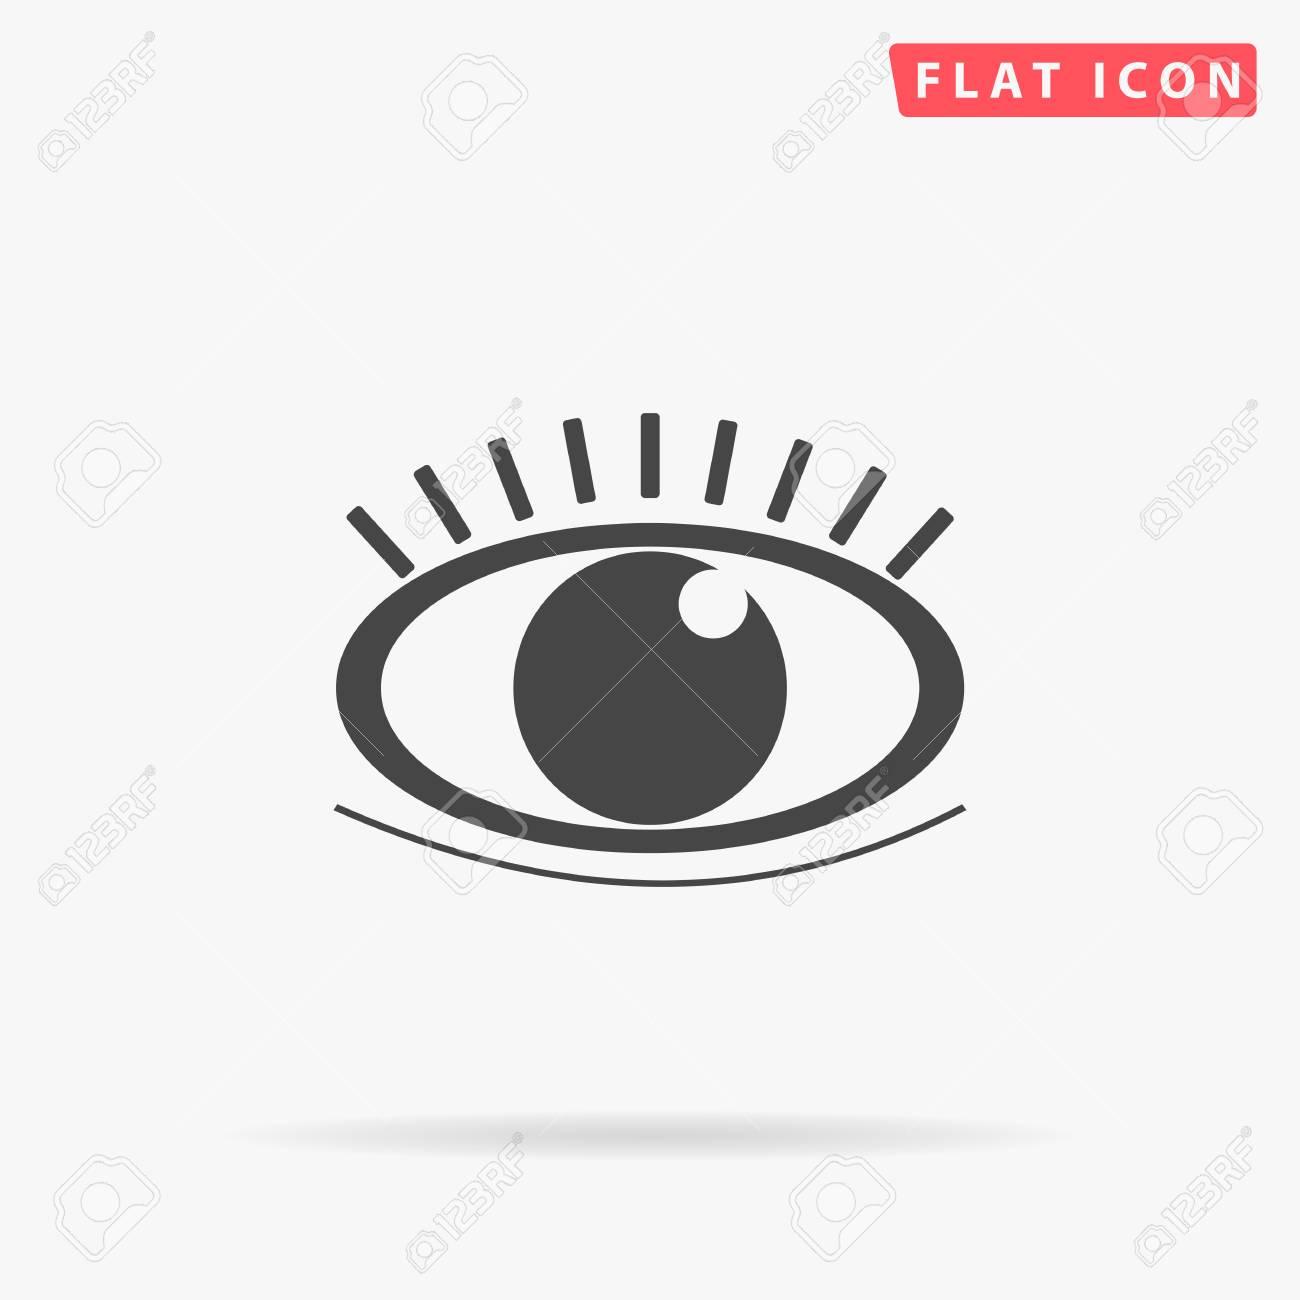 hight resolution of eye icon eye icon vector eye icon jpeg eye icon object eye